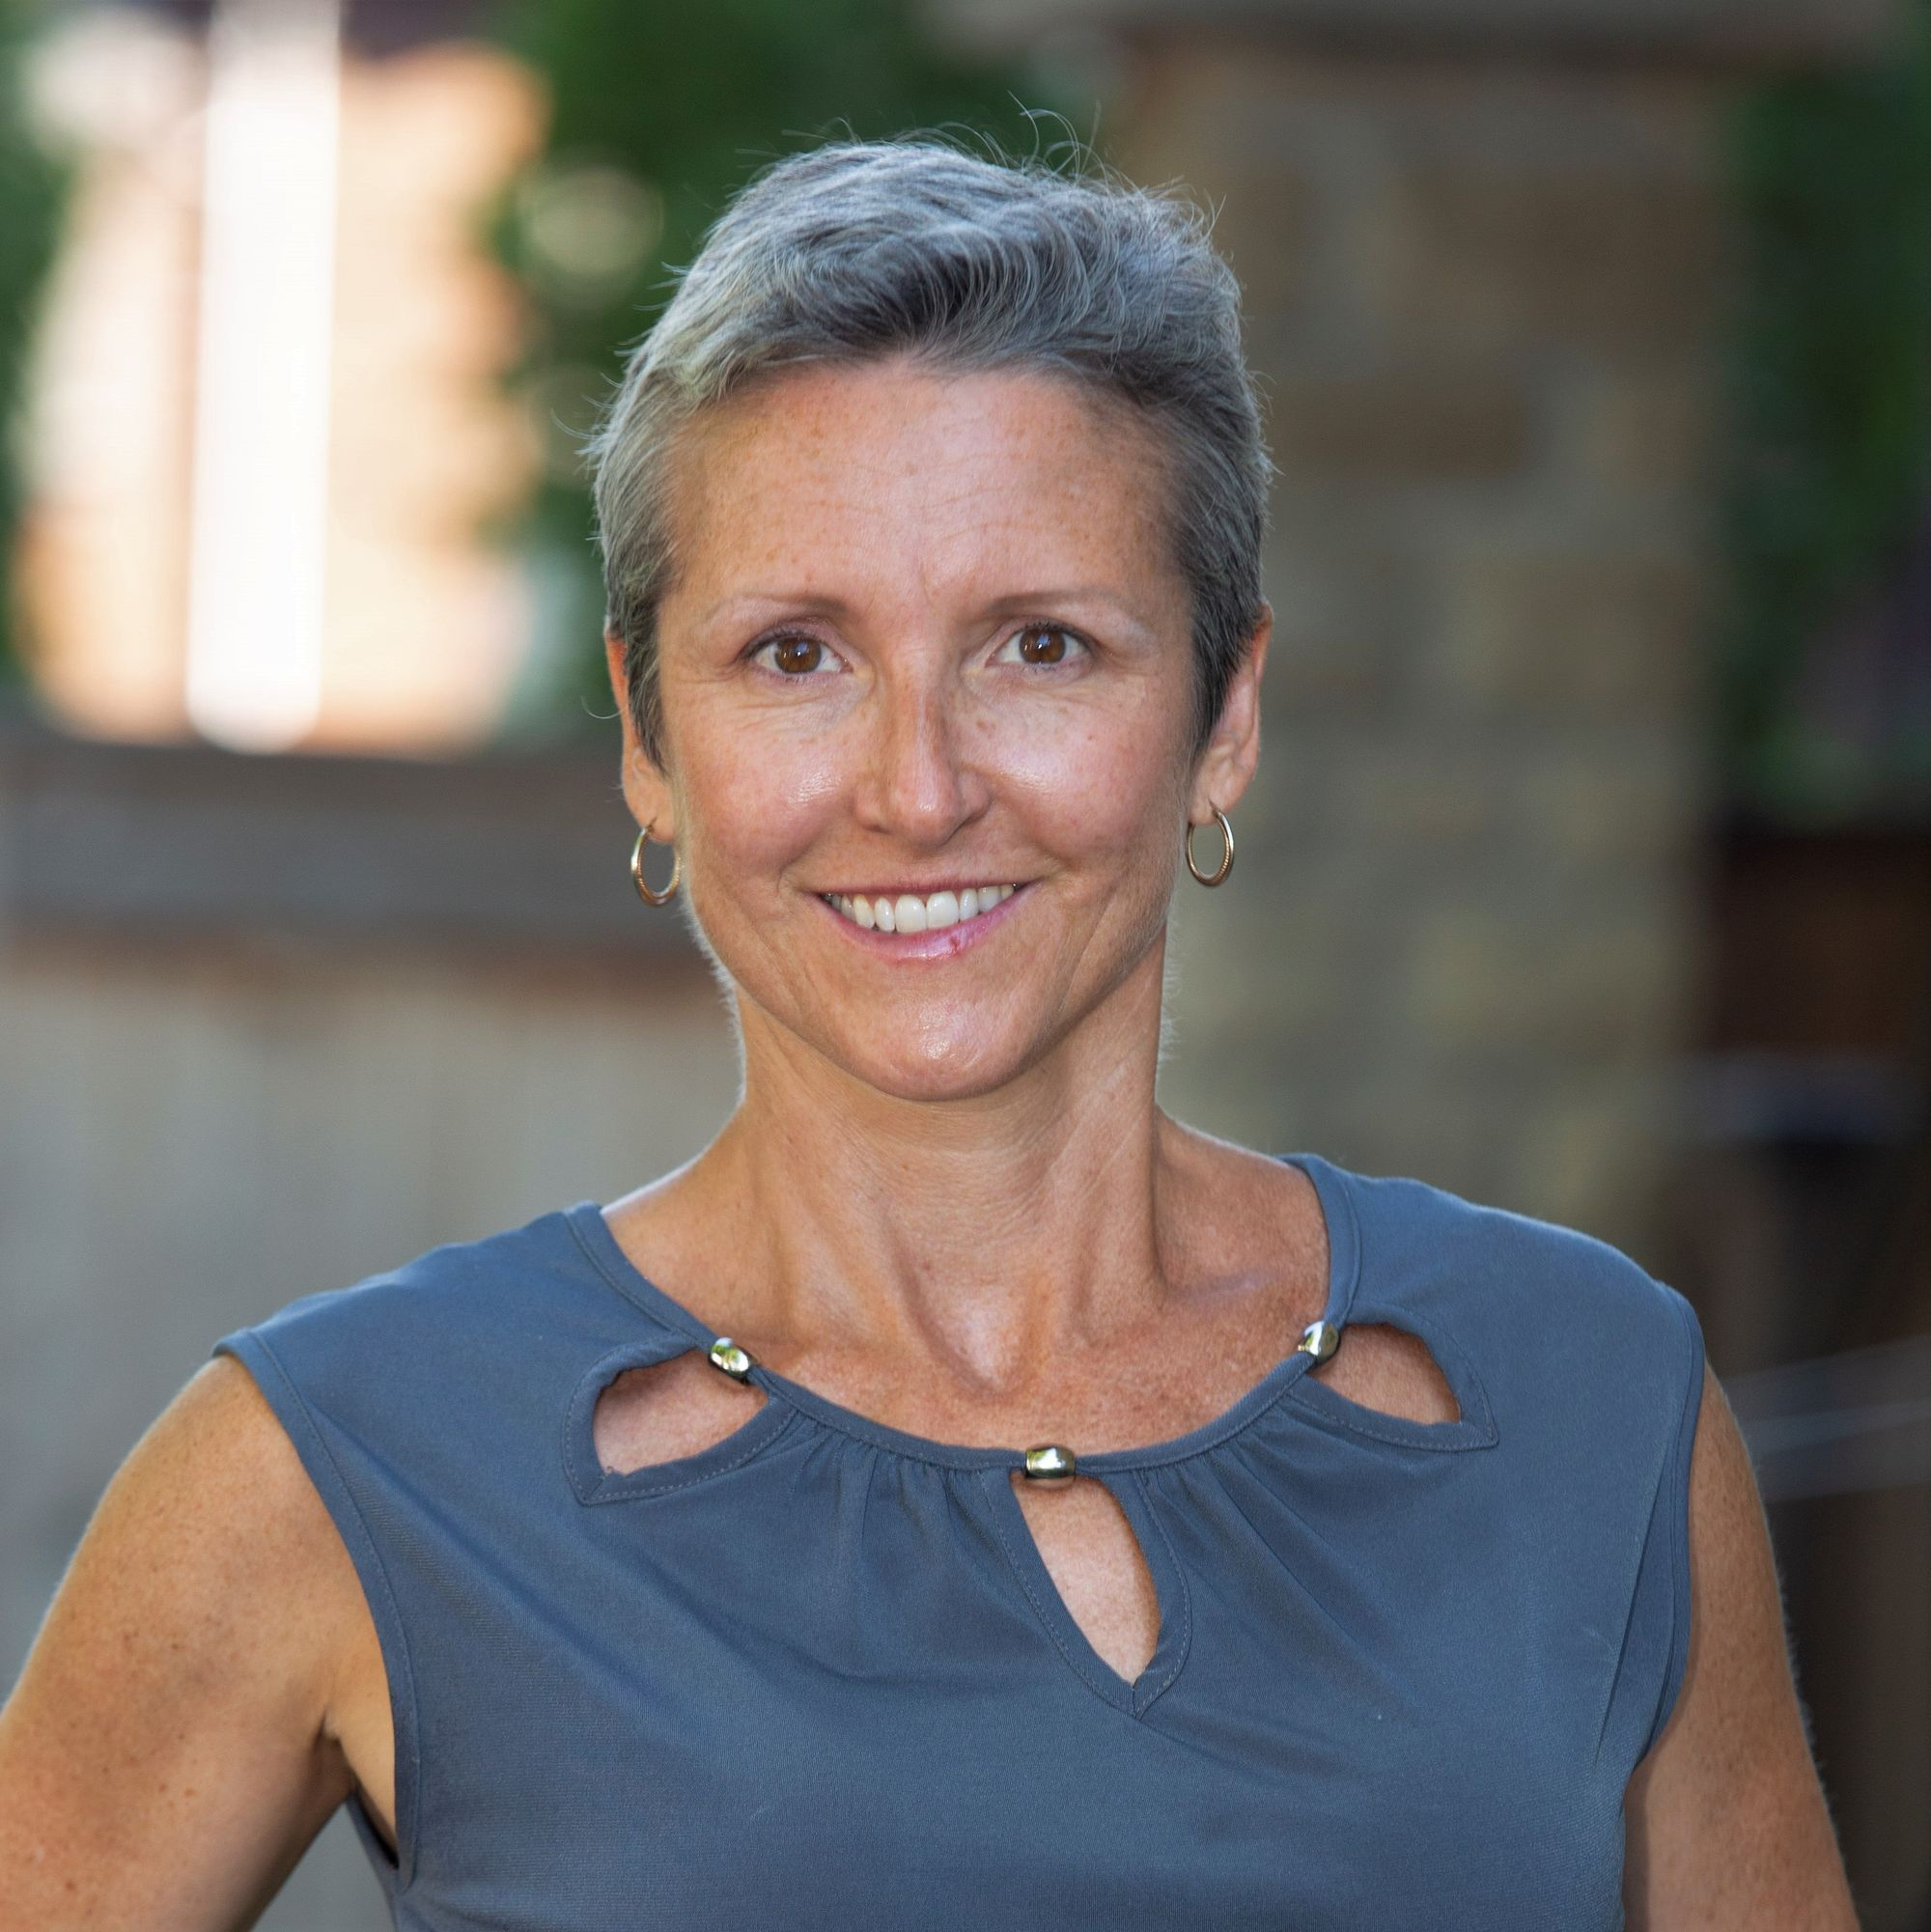 Finding purpose after beating cancer - Jennifer Smrz